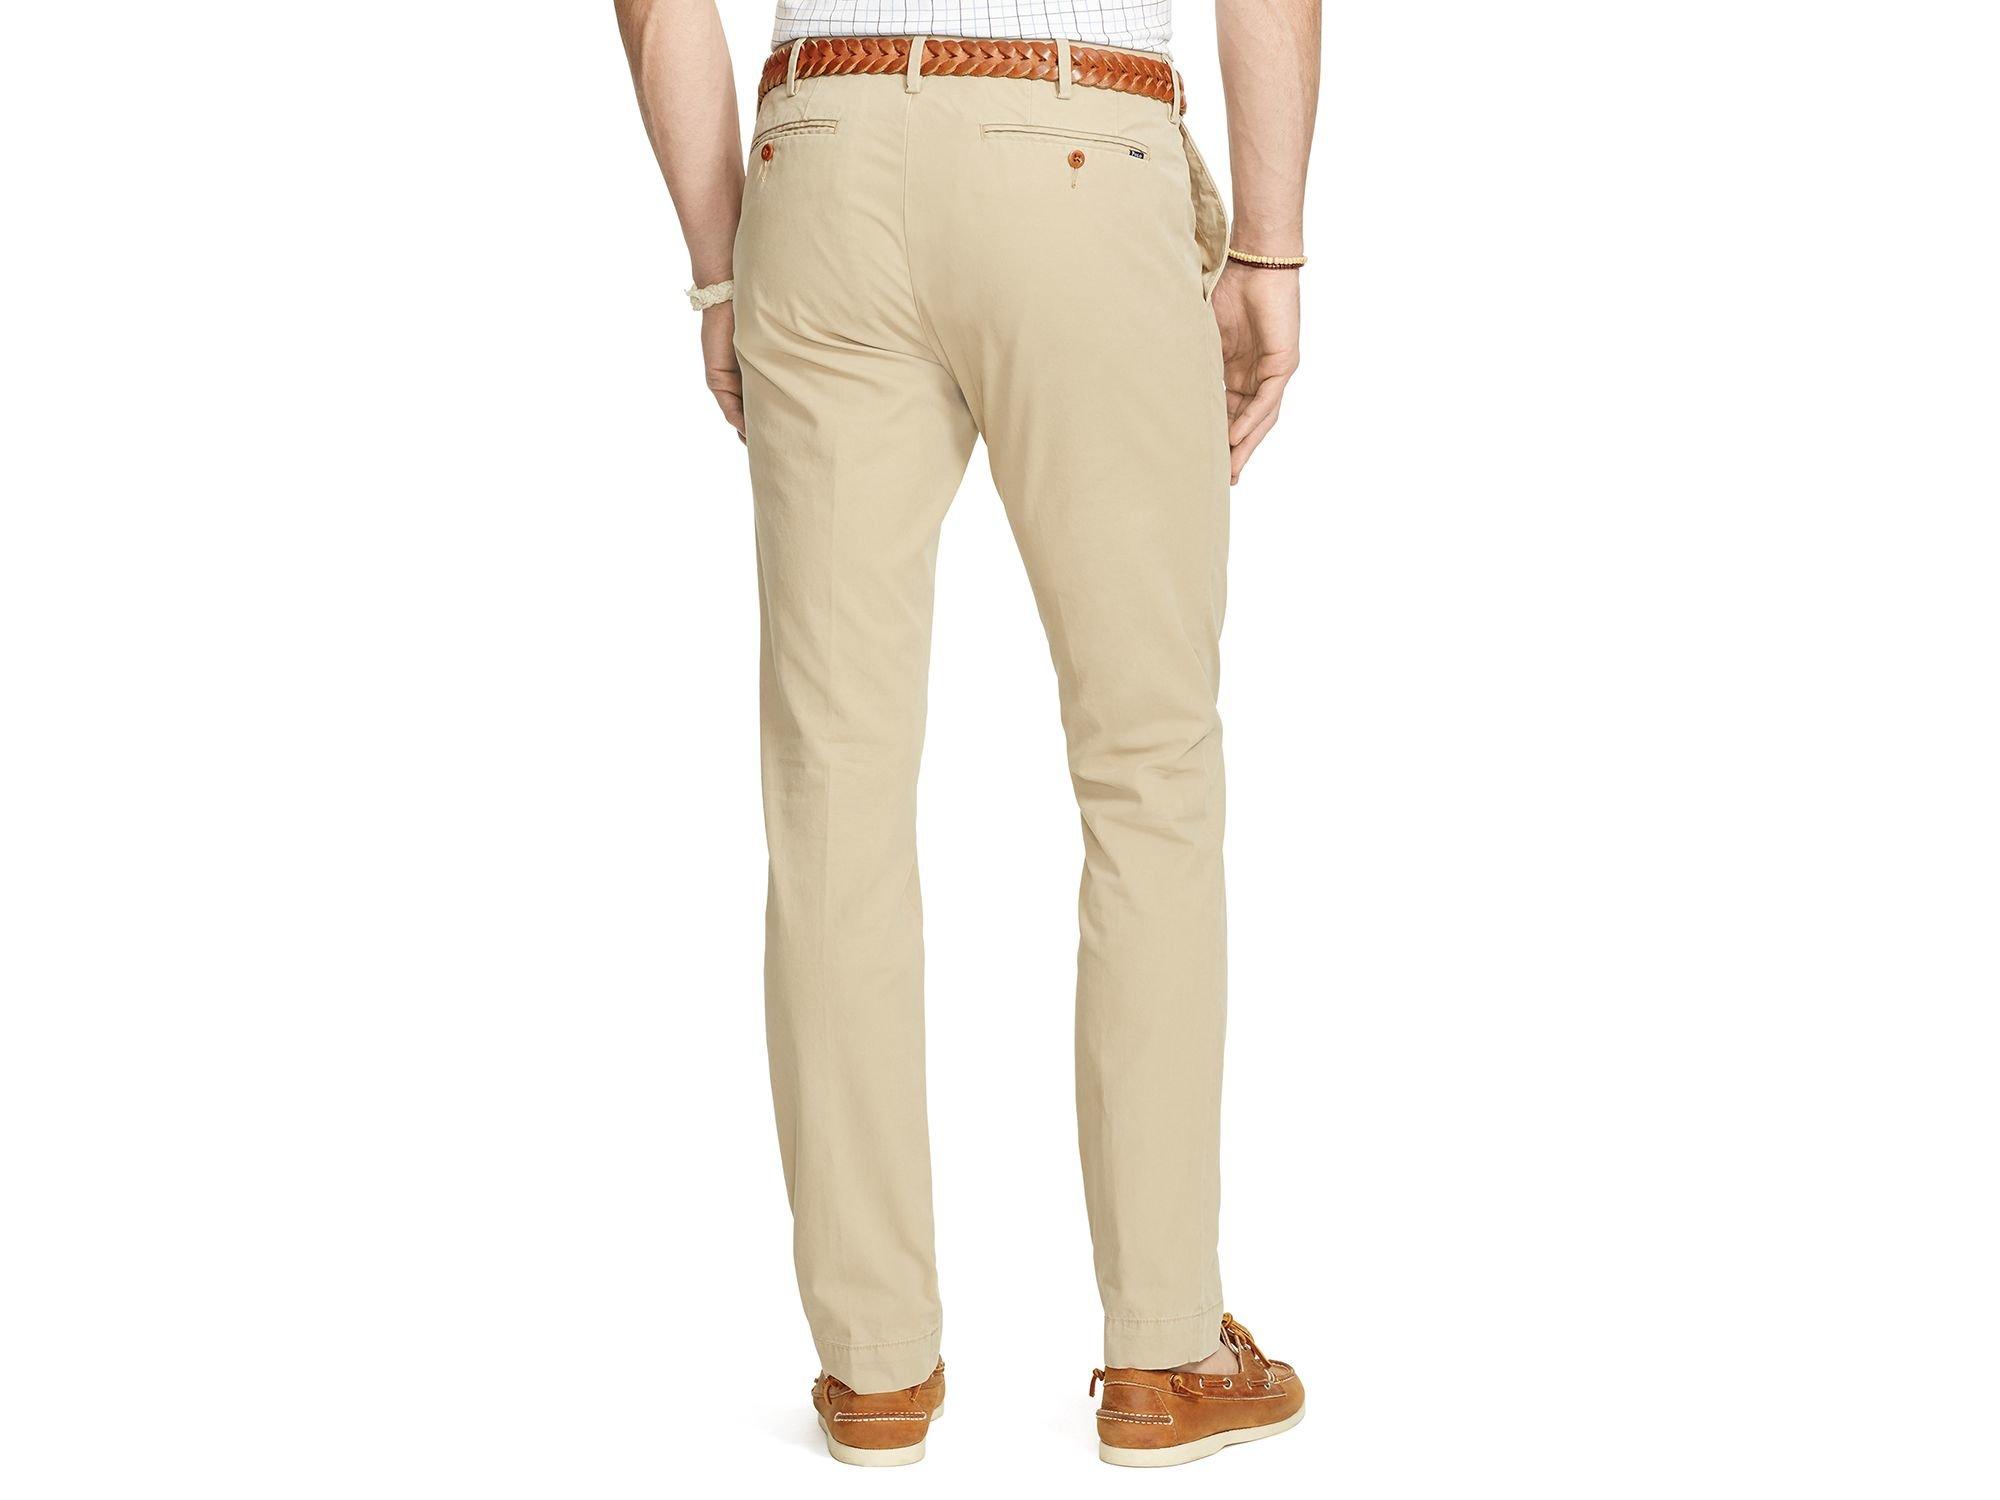 d905982b4 Ralph Lauren Polo Newport Slim Fit Chino Pants in Natural for Men - Lyst